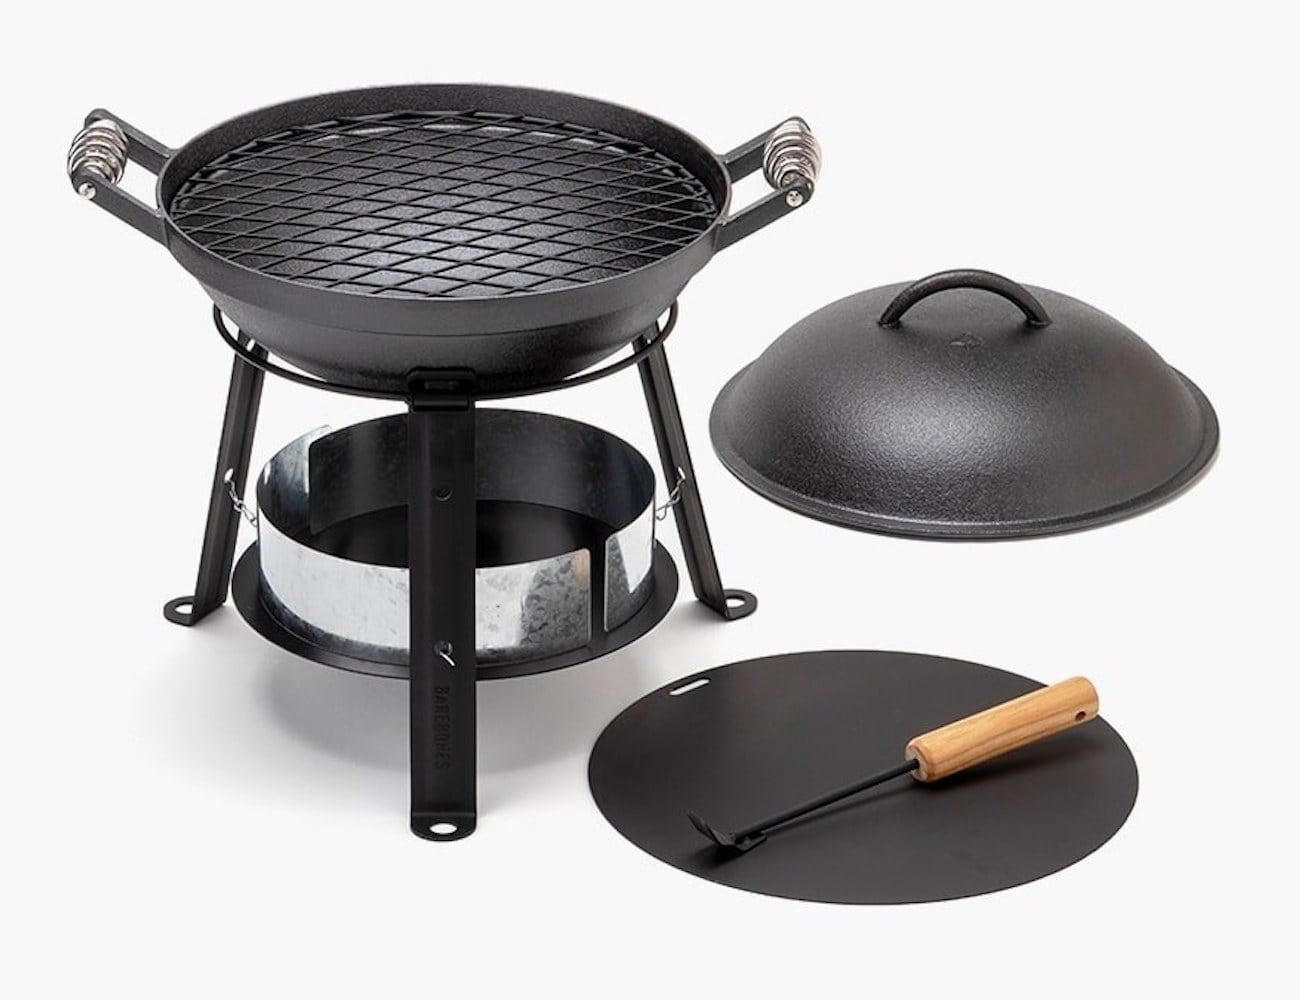 barebones kitchen cast iron review